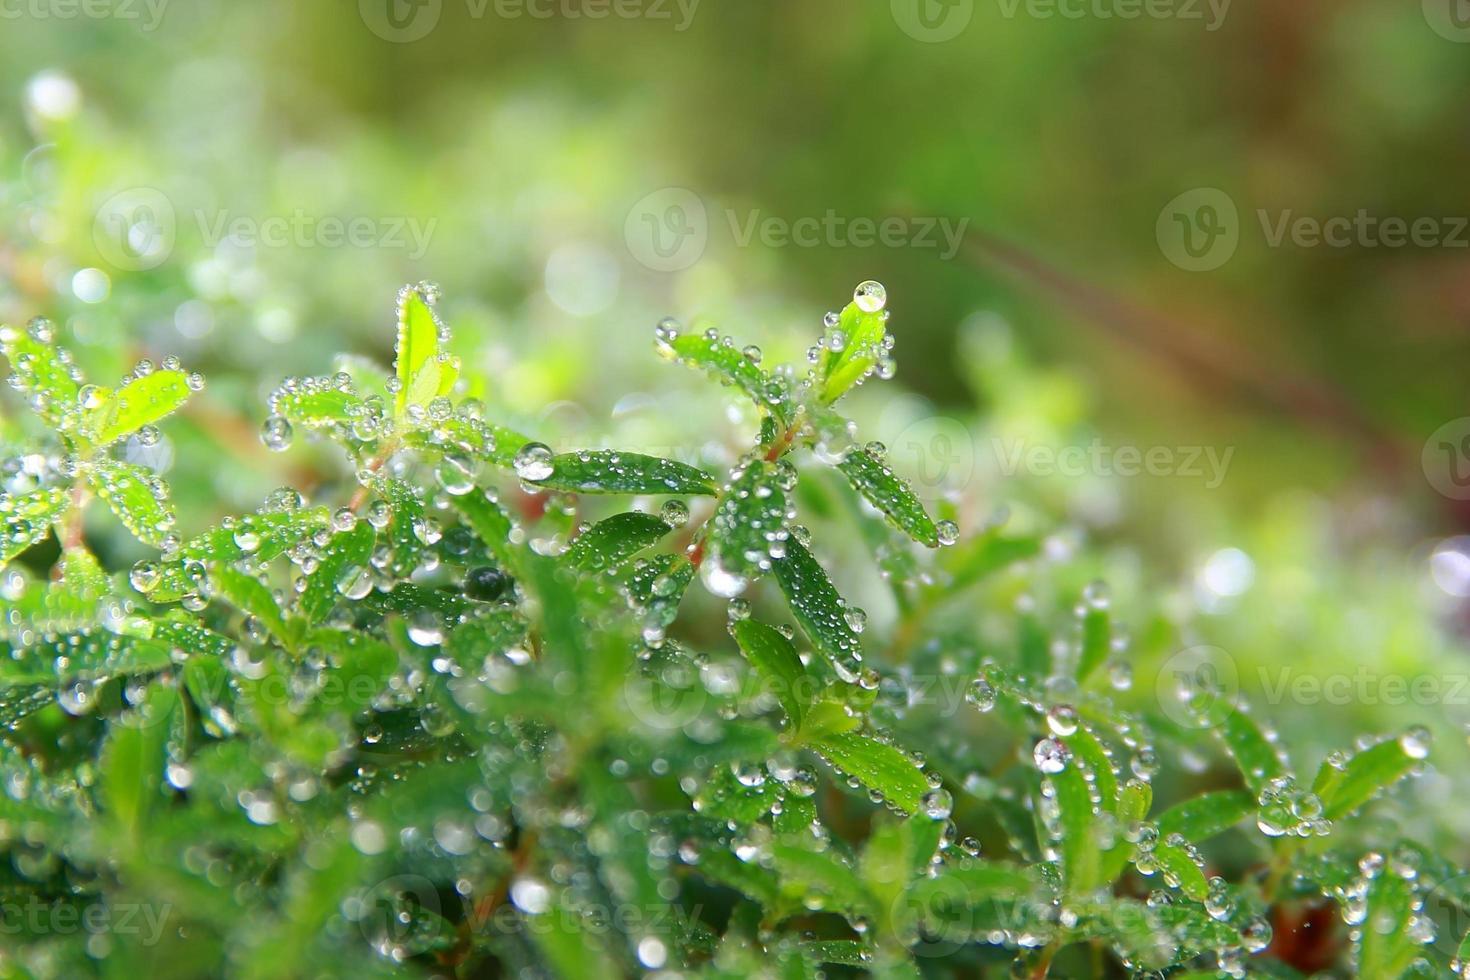 planta verde y gota de agua foto